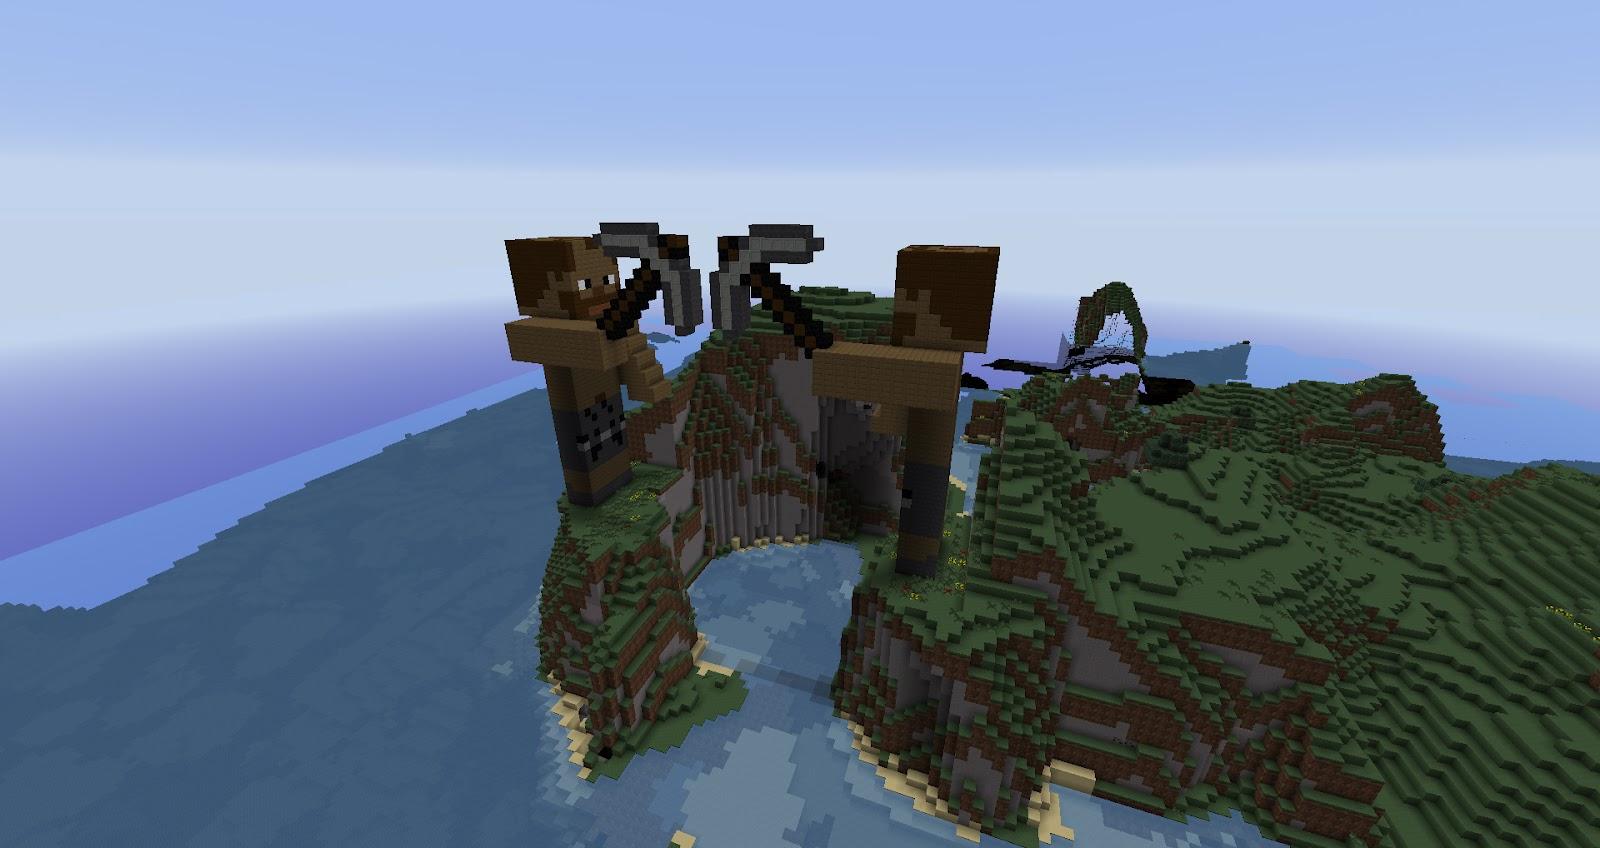 http://4.bp.blogspot.com/-sug2NqP_pK0/T7366C-BV8I/AAAAAAAABW8/JiW45PX-efE/s1600/Minecraft_gate.jpg